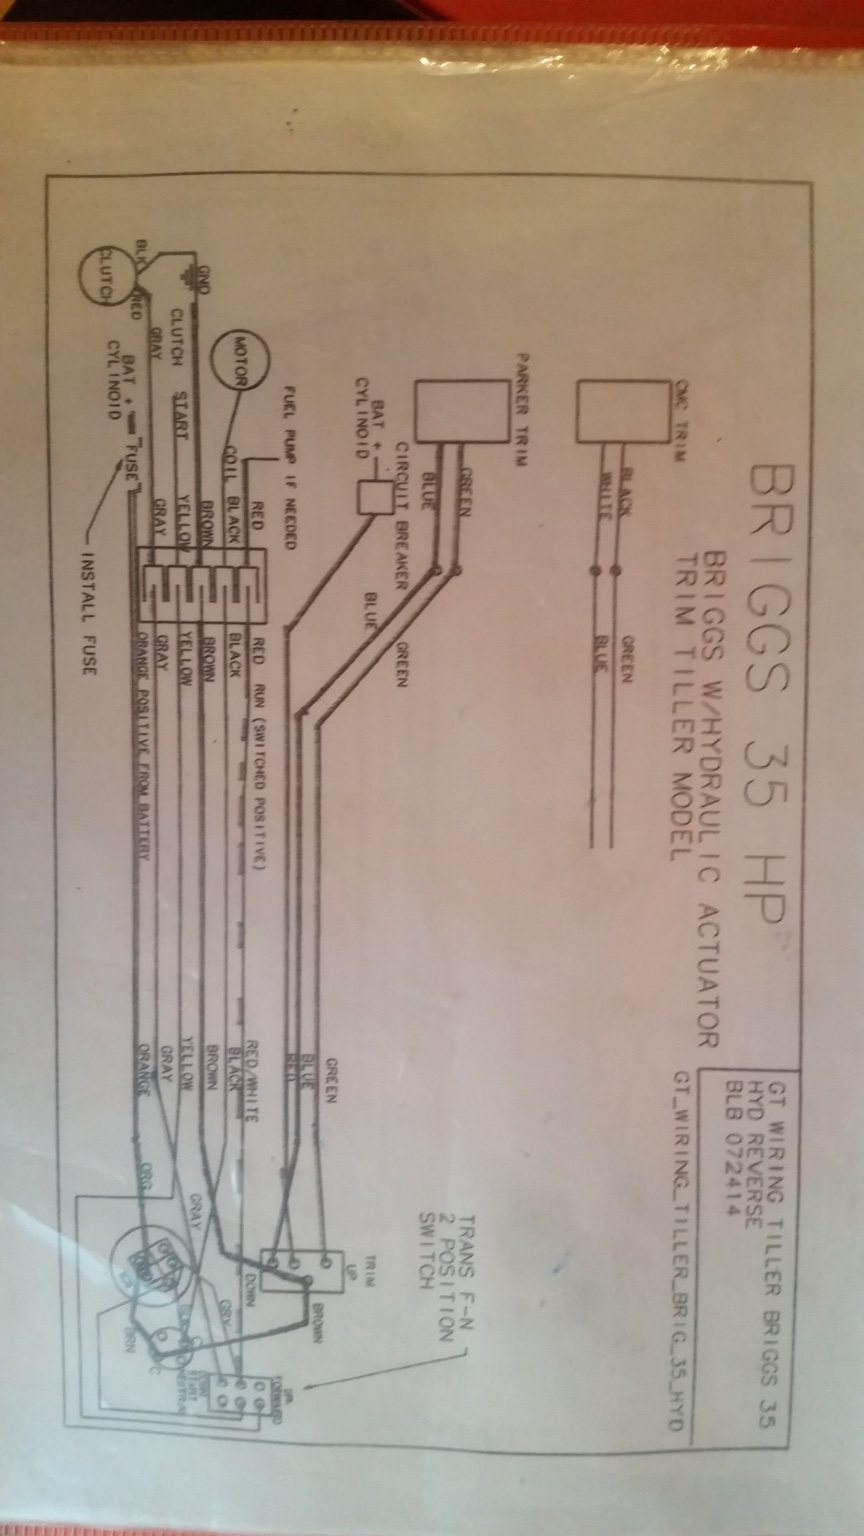 View Topic Gtr Wiring Cmc Tilt Trim Diagram Updated